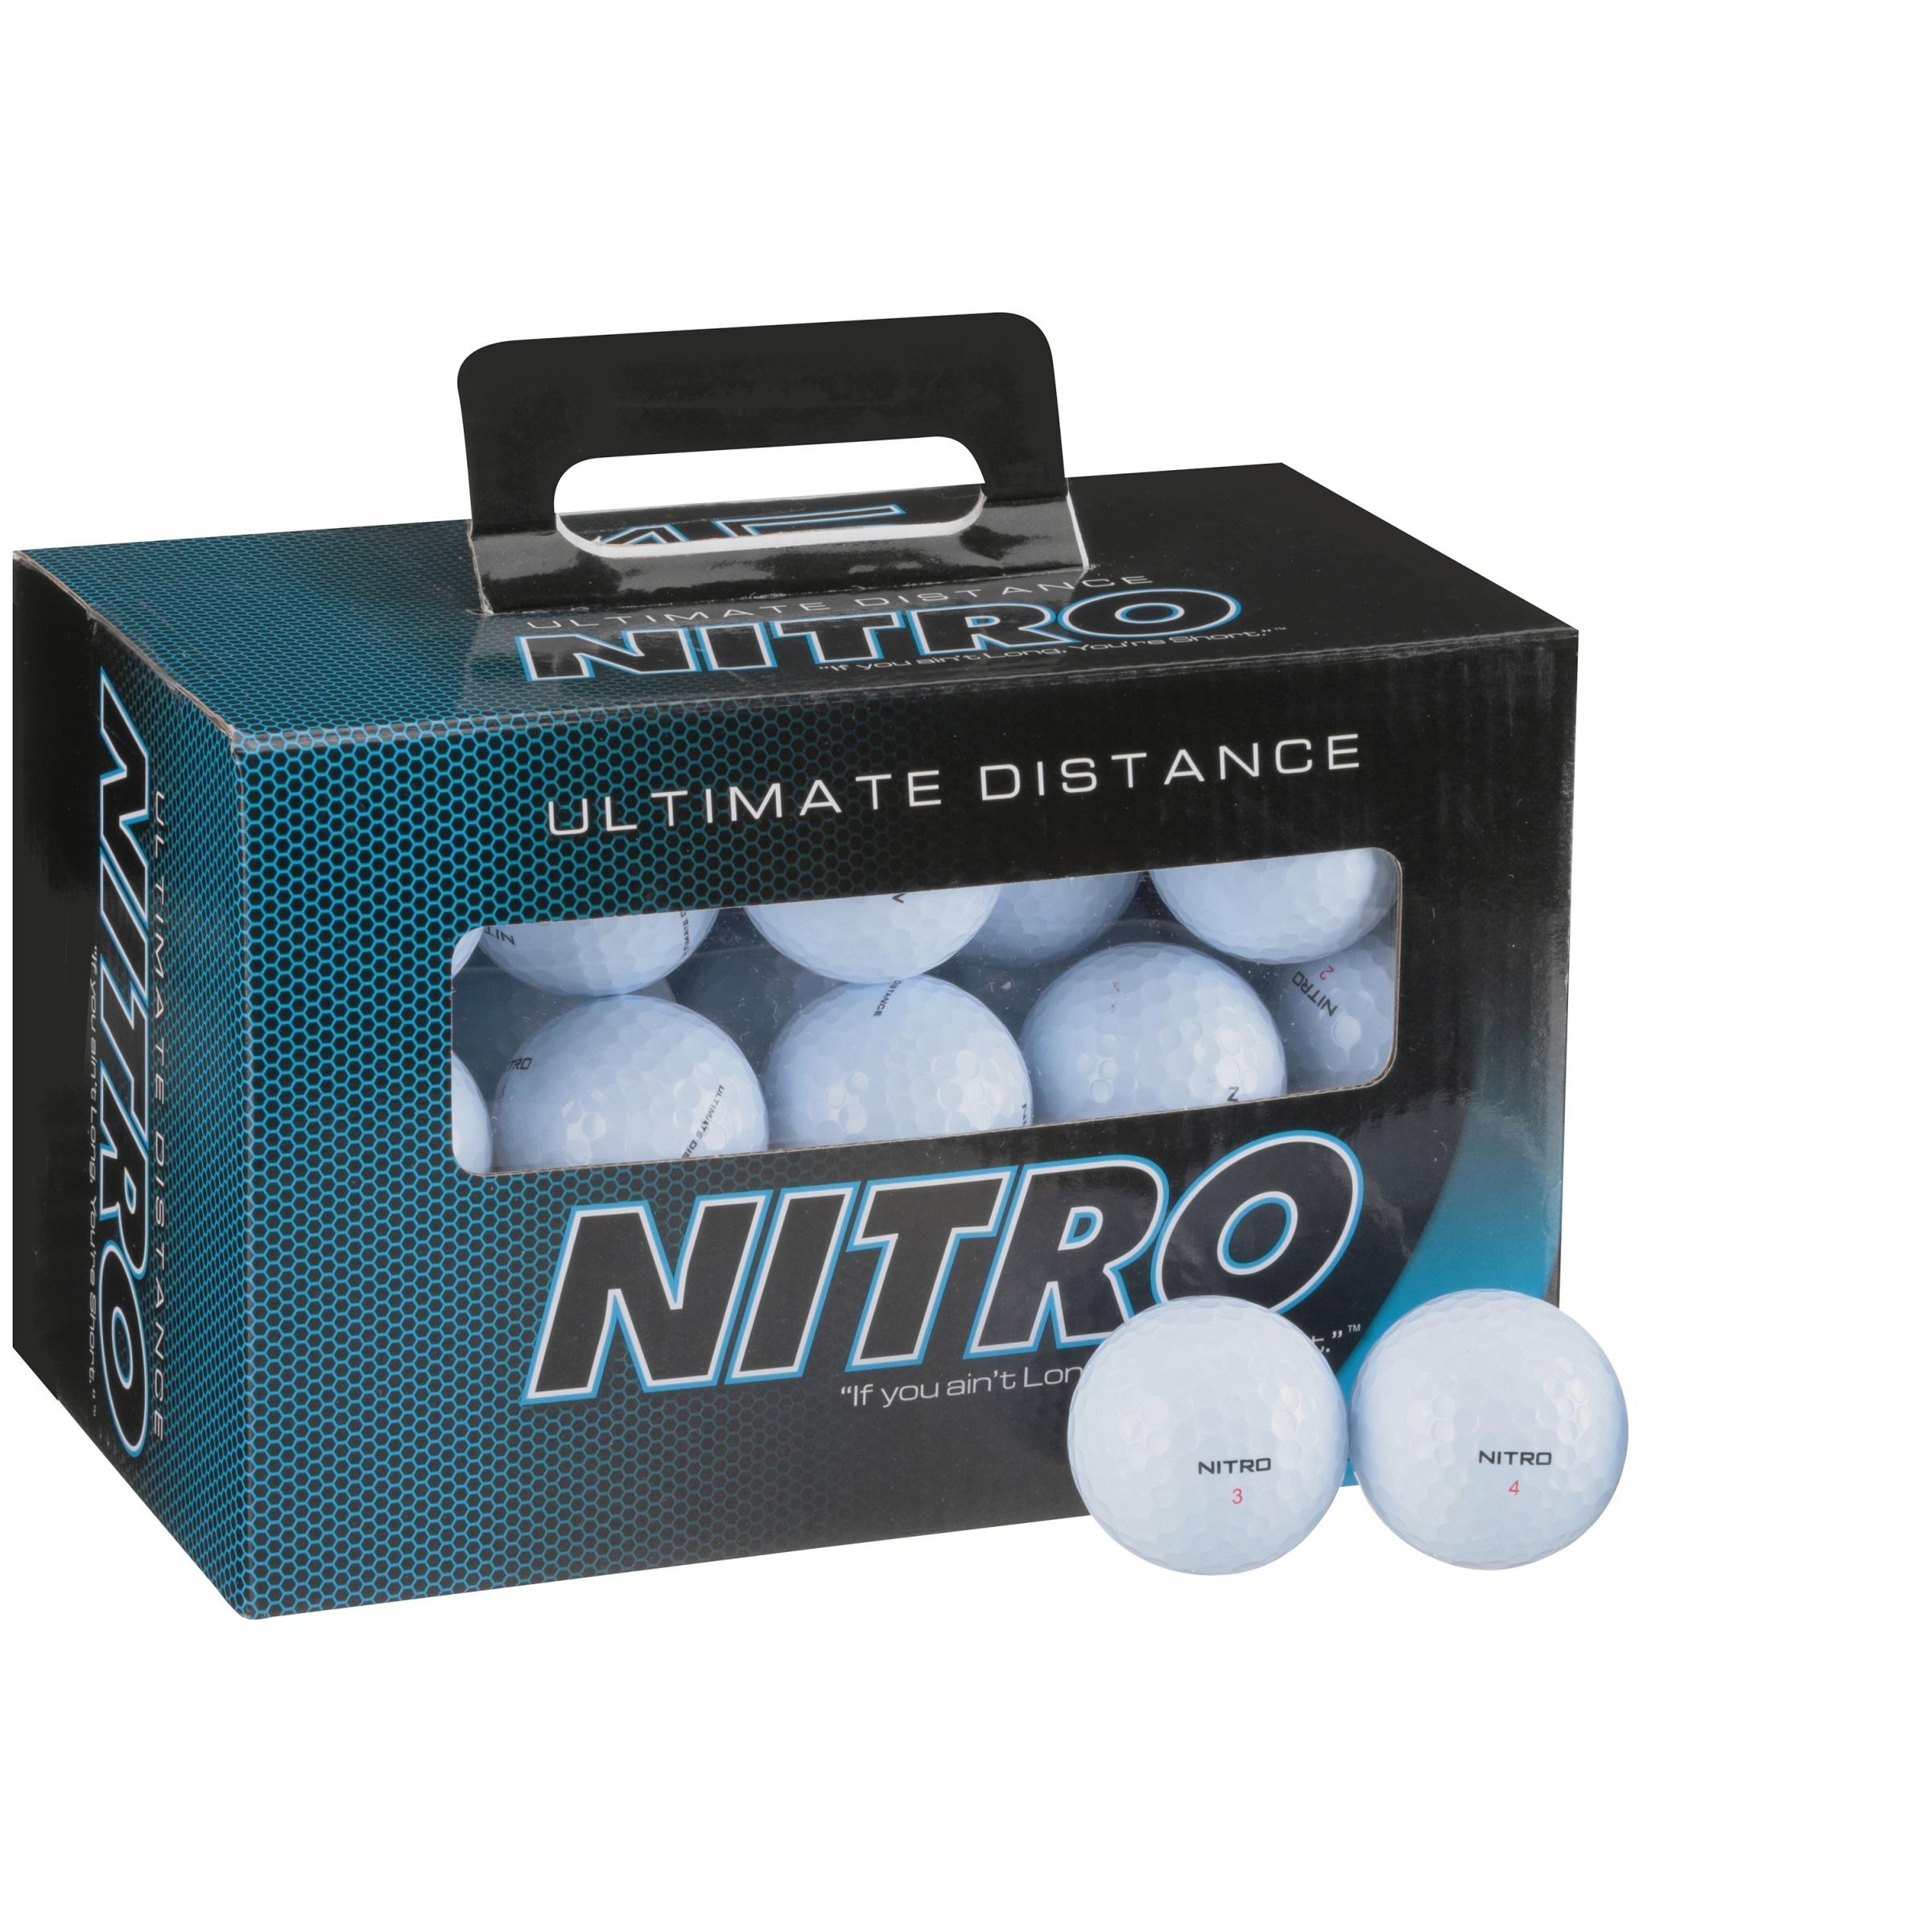 Nitro Ultimate Distance Golf Balls, 45 Pack